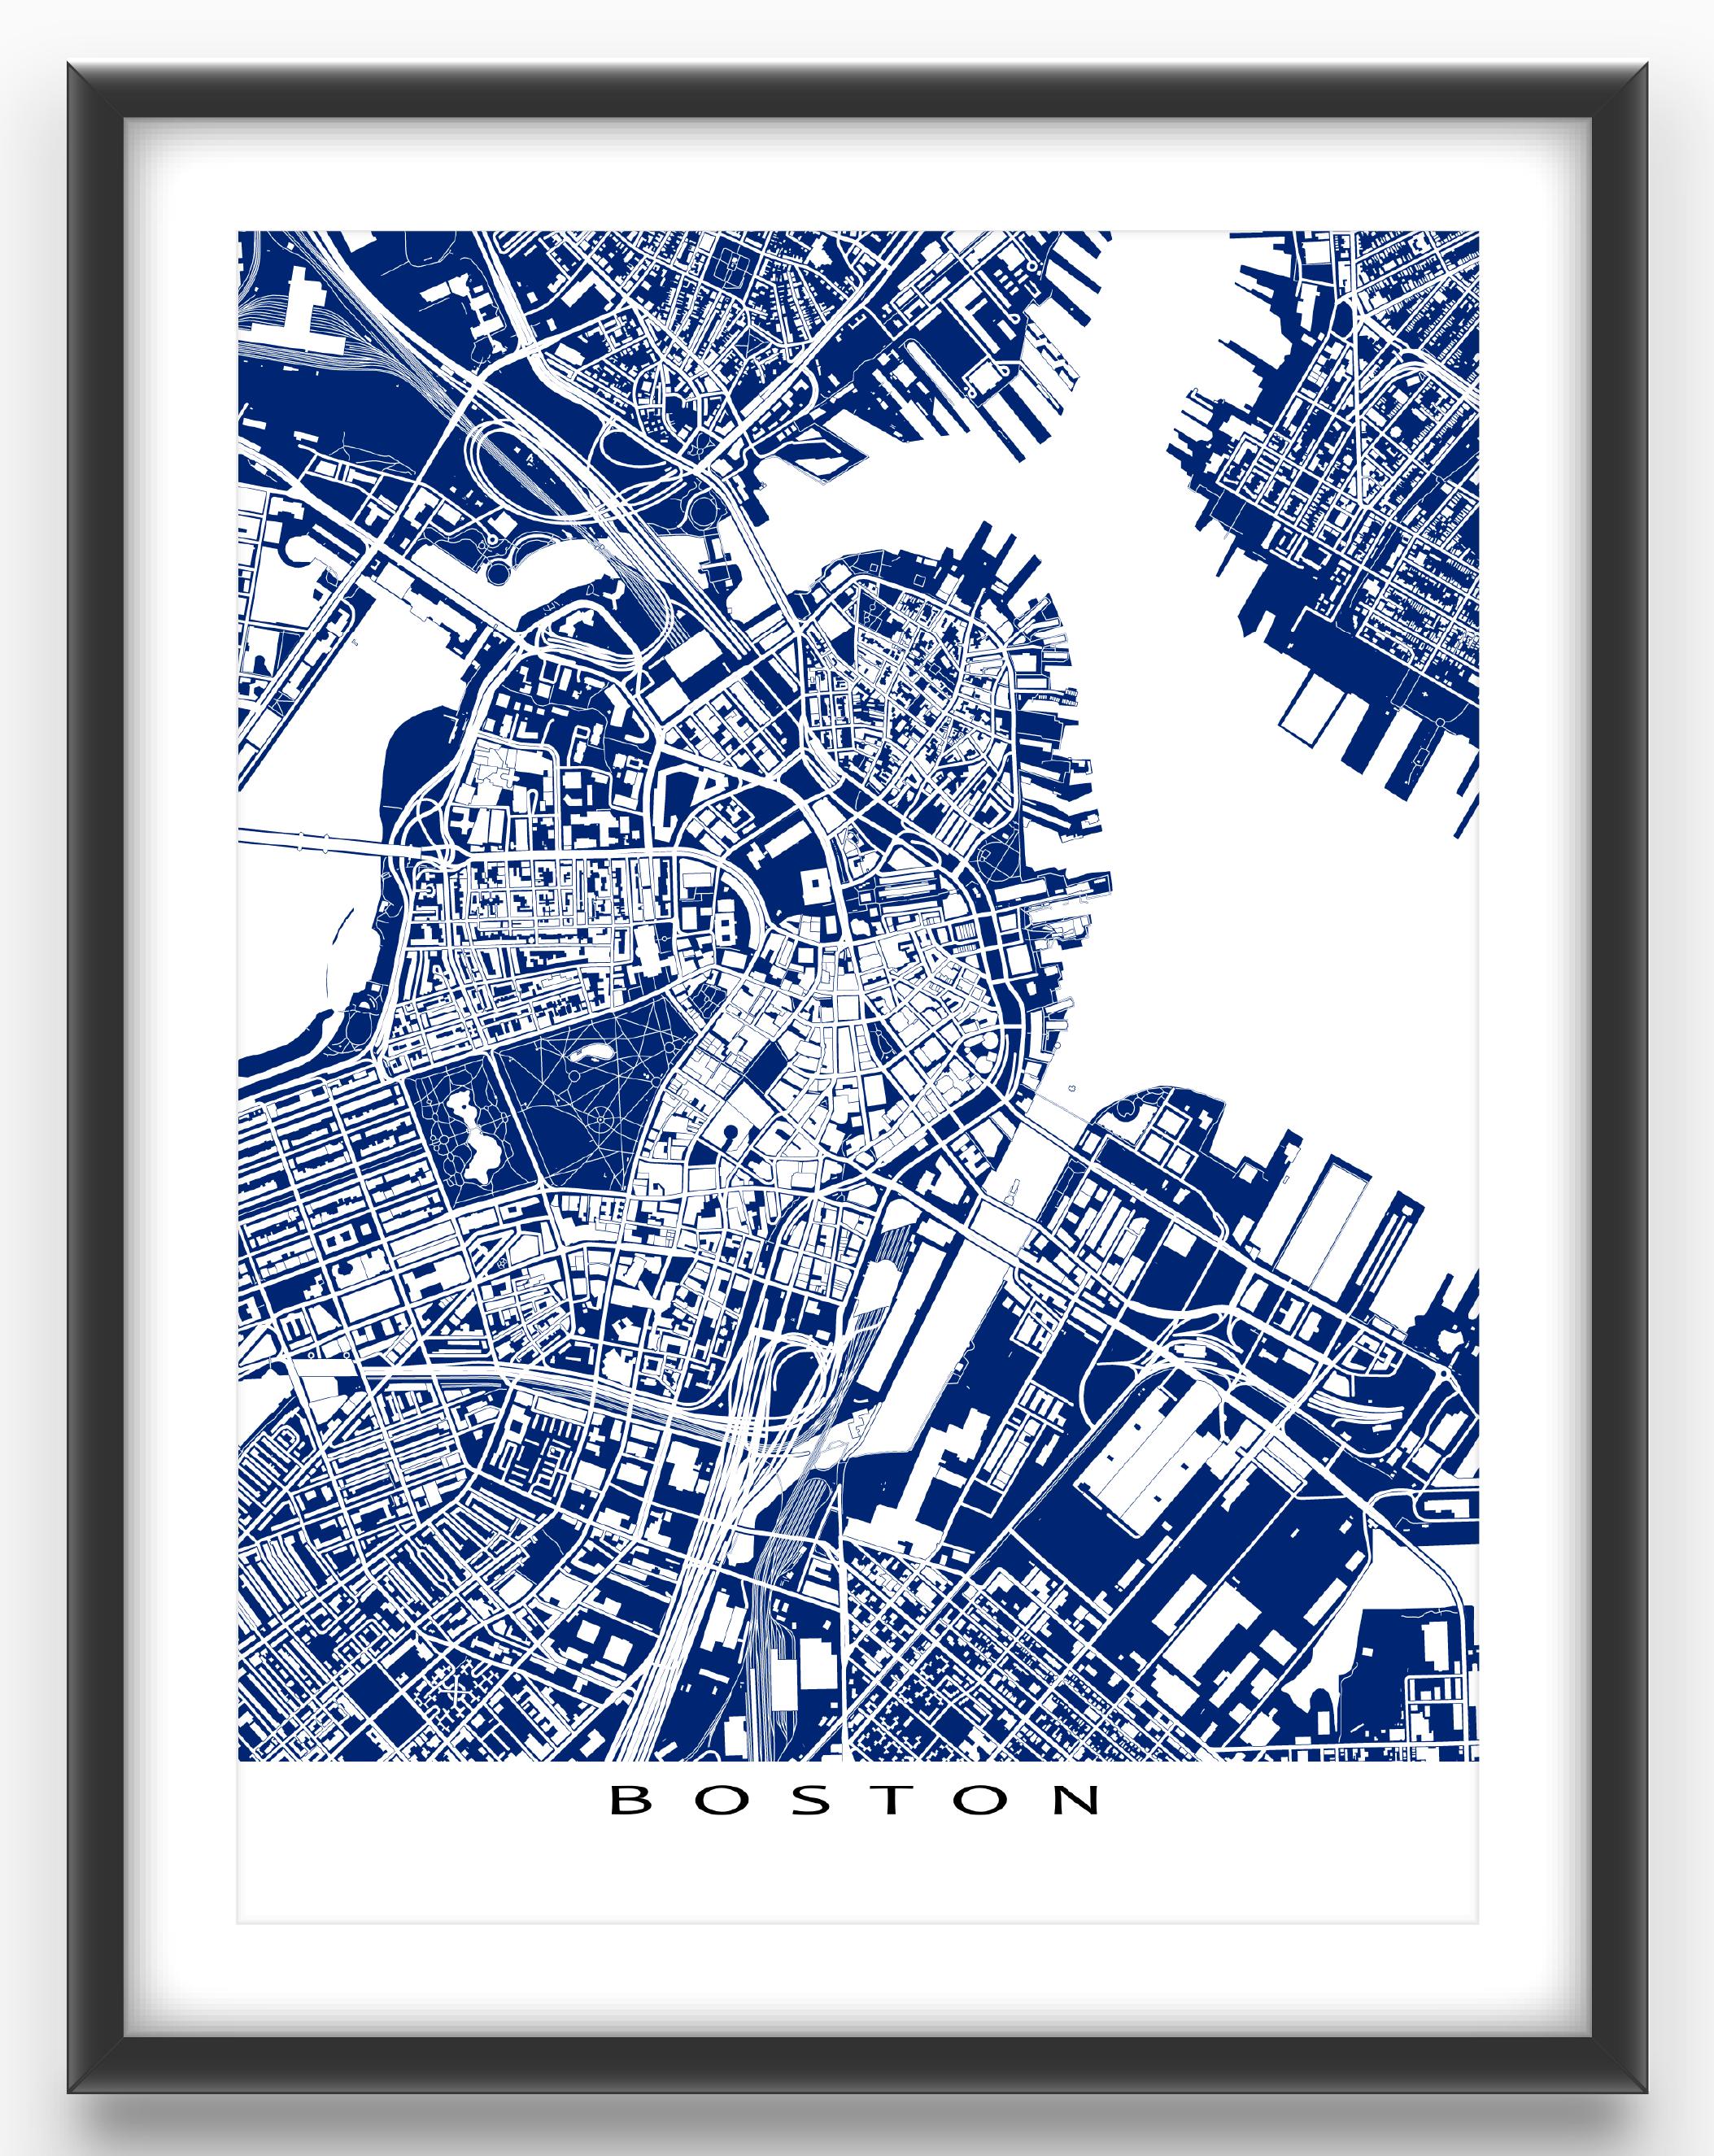 Boston map print featuring the fantastic city of Boston ...